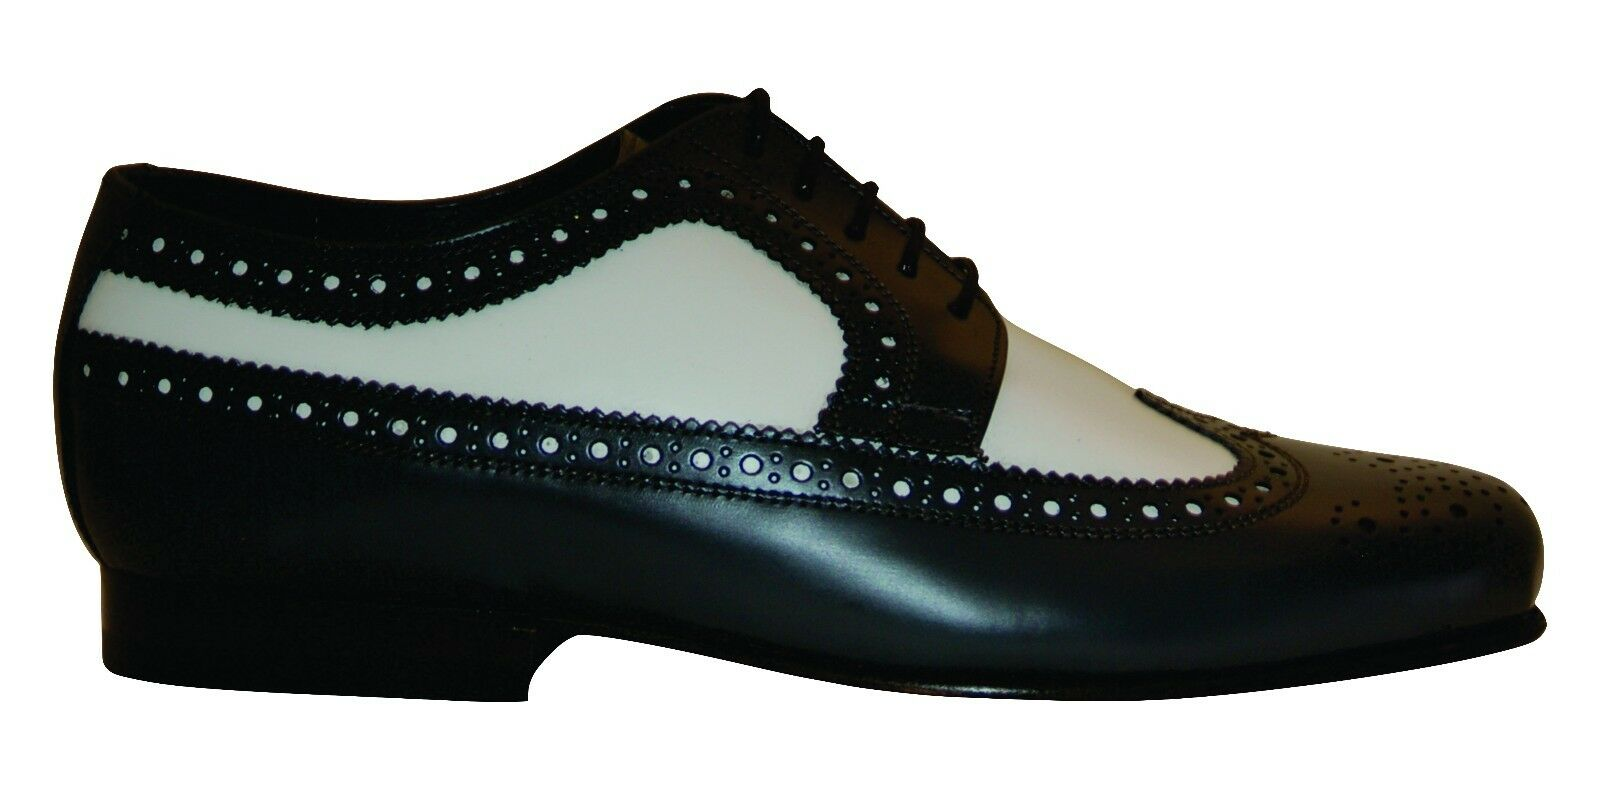 prima qualità ai consumatori nero and bianca Wingtips Vintage style Spectator scarpe with with with Thin soles  vendita calda